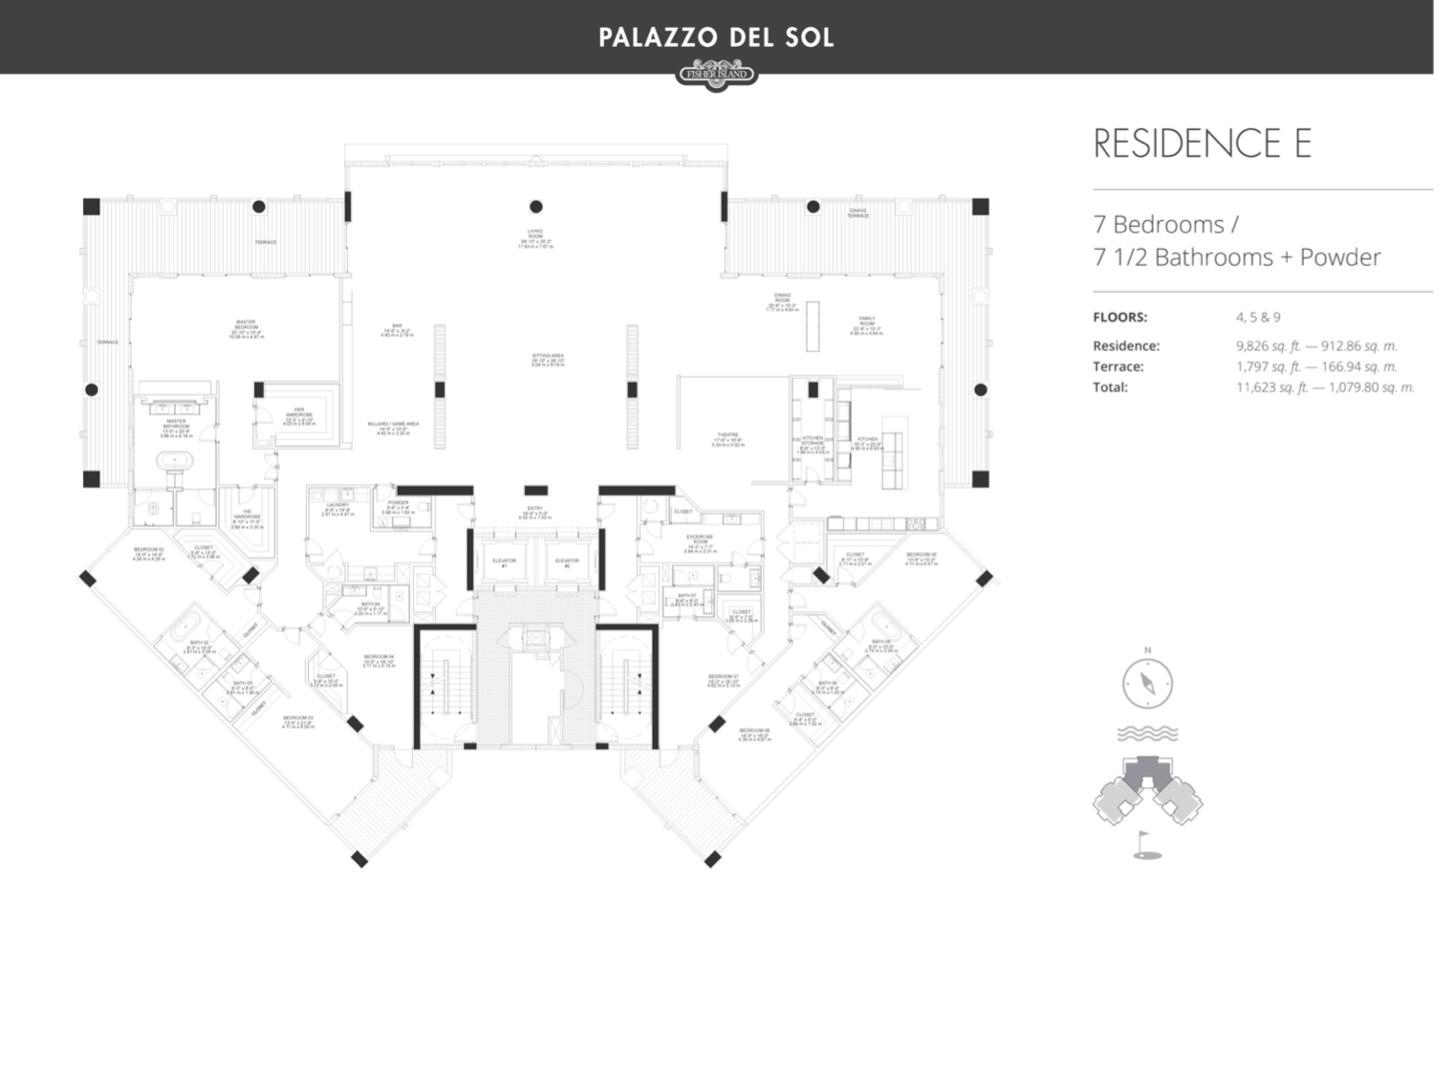 Floor plan image E 4-5 - 3/3  - 9826 sqft image